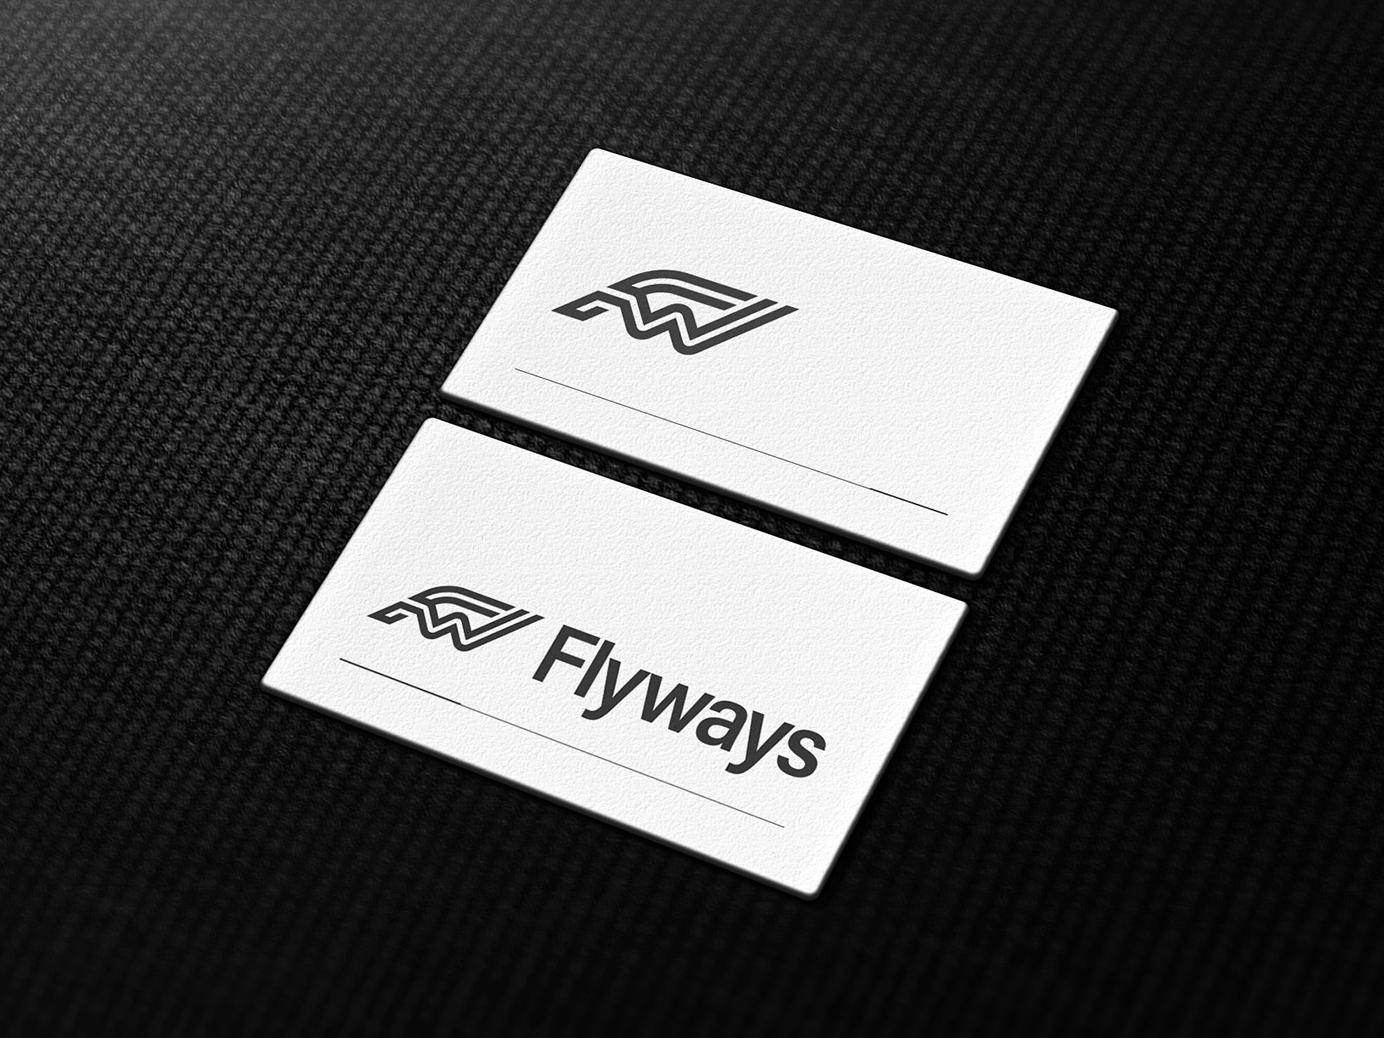 FW (2) design logotype symbol monogram branding symbol designer identity designer typography identity brandmark logo designer logo design mark logo